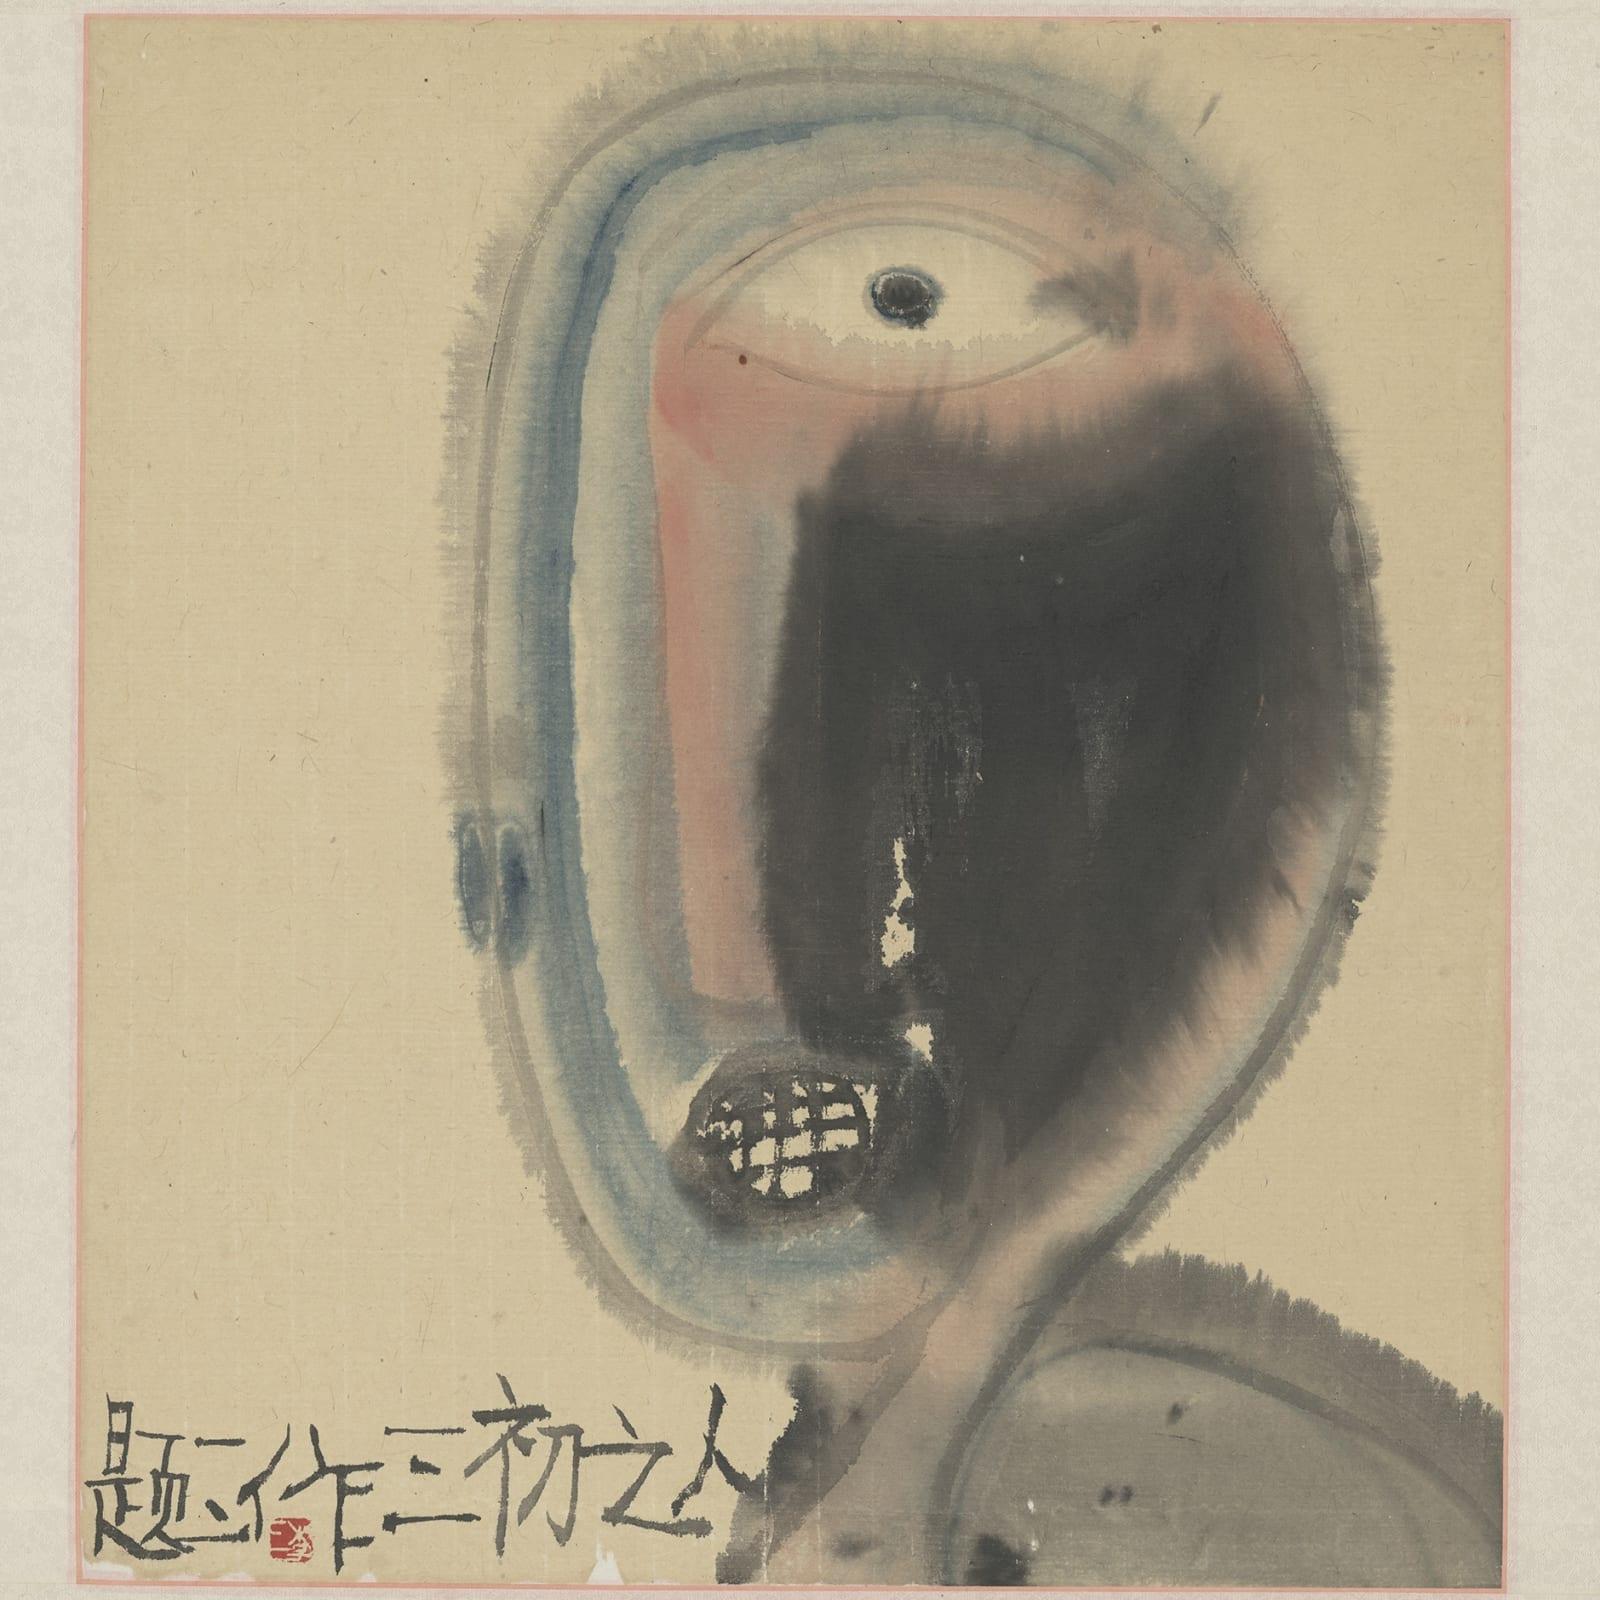 Li Jin 李津, The Tibet Series IV 西藏组画之四, 1984